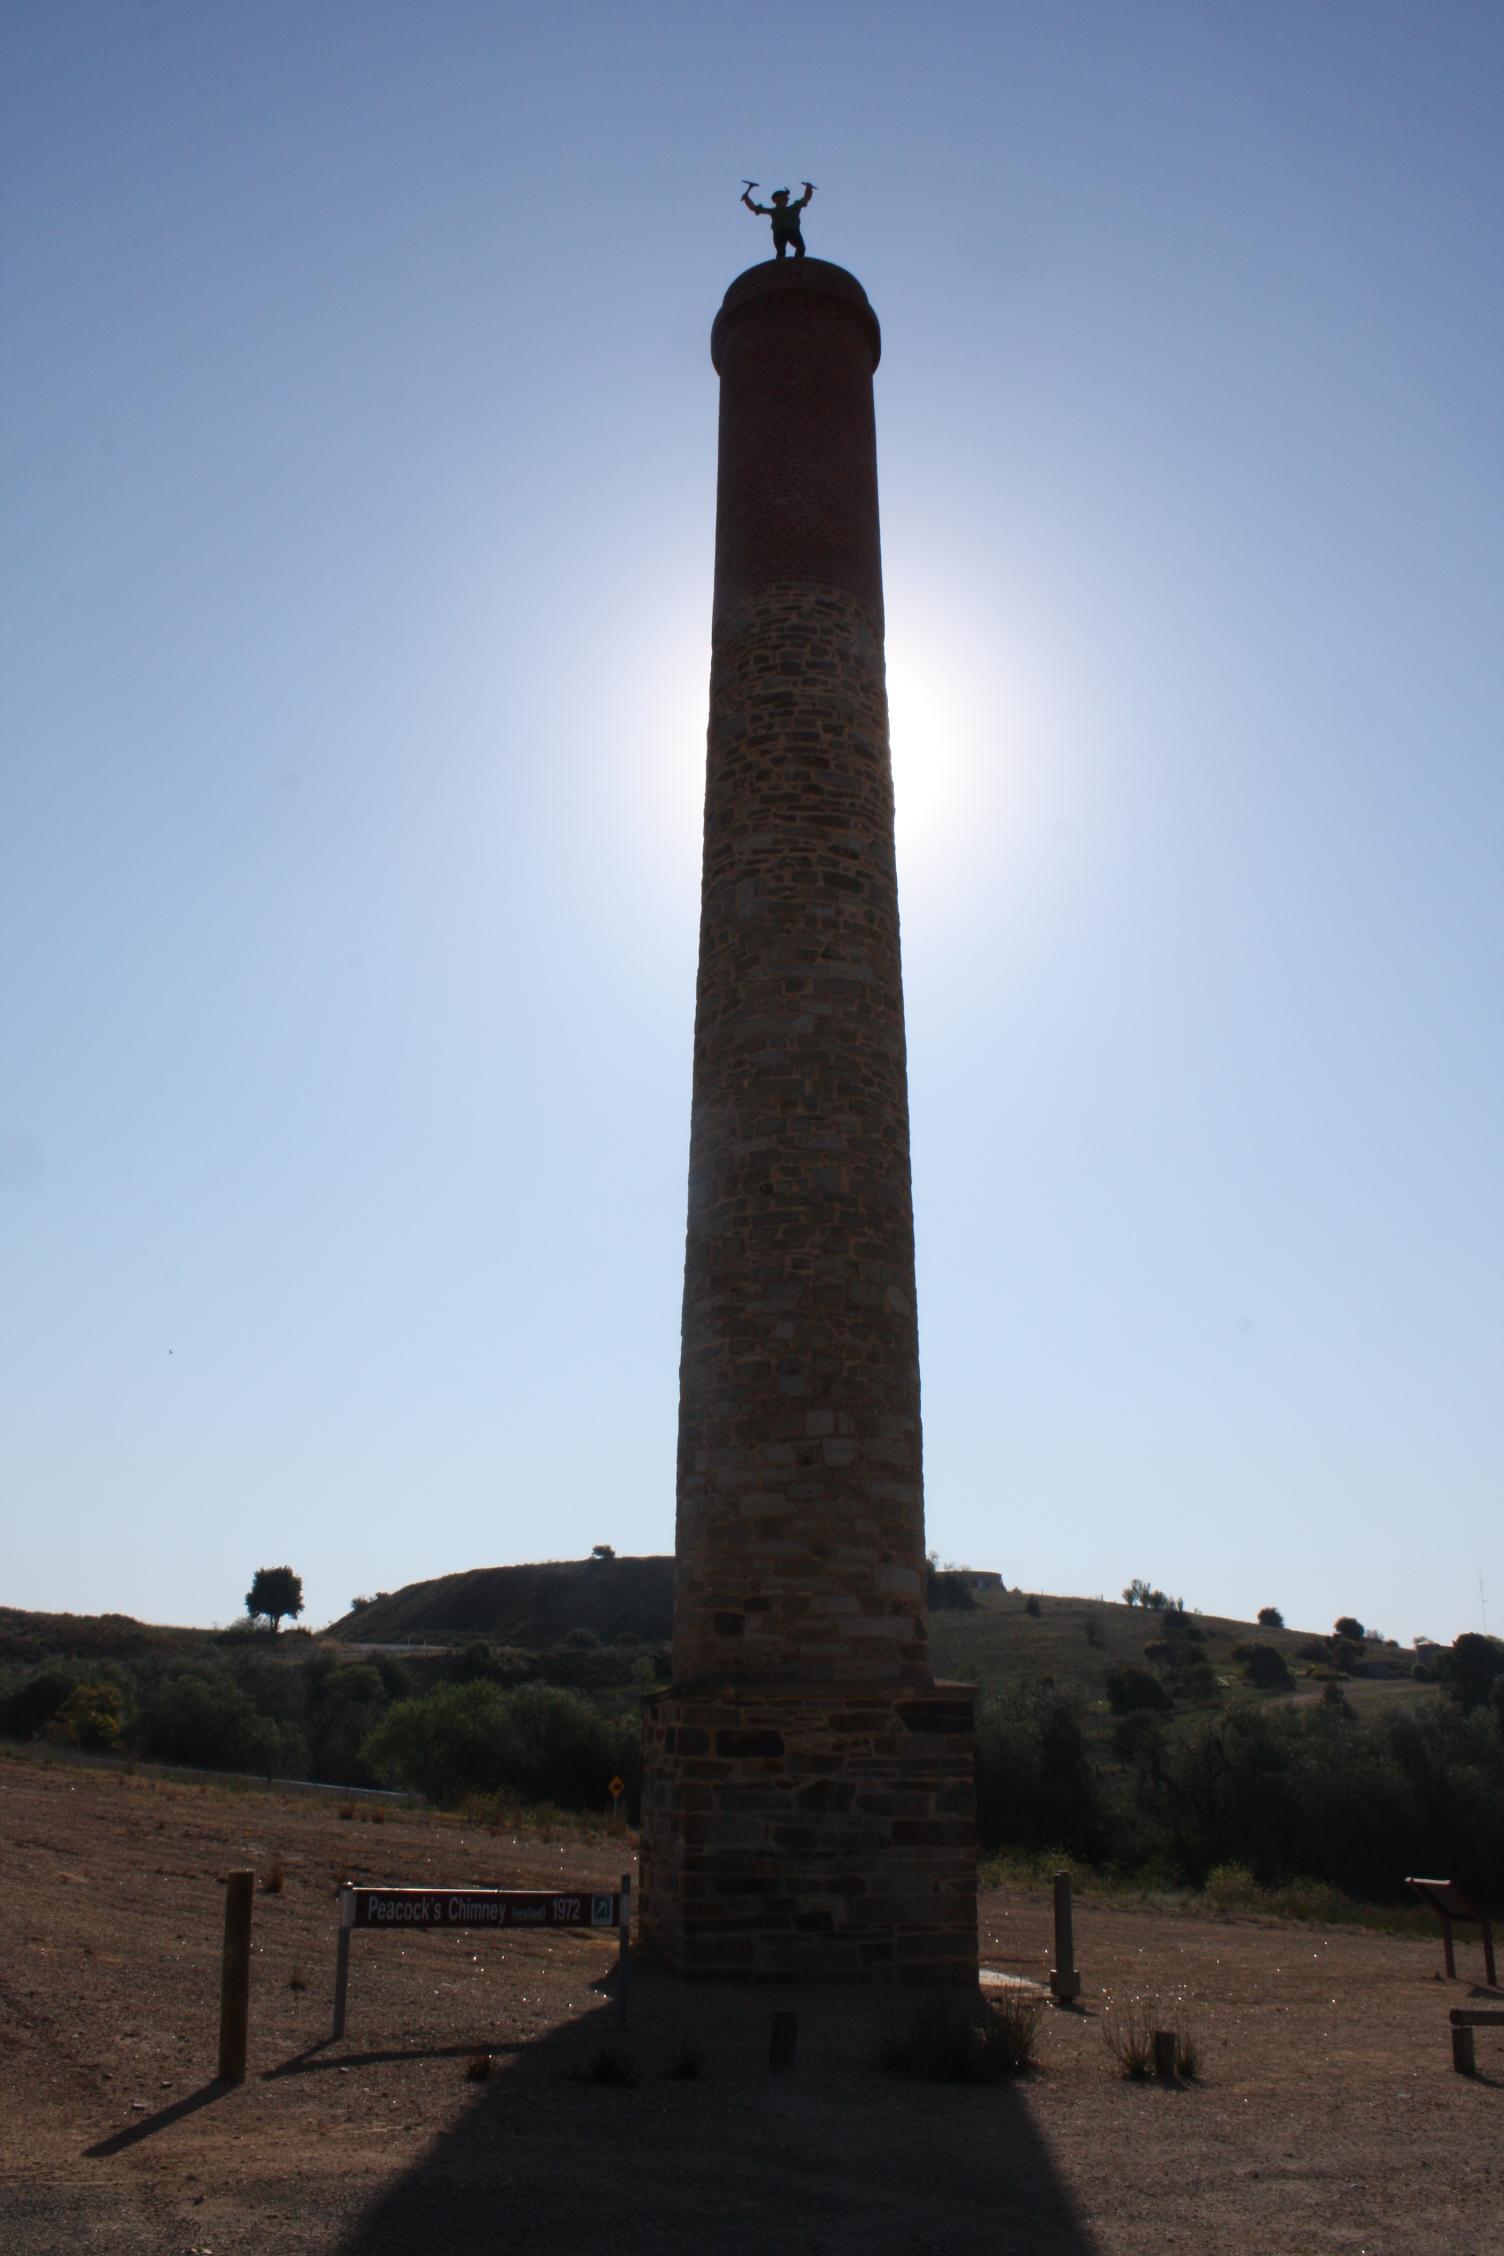 Chimney at Burra